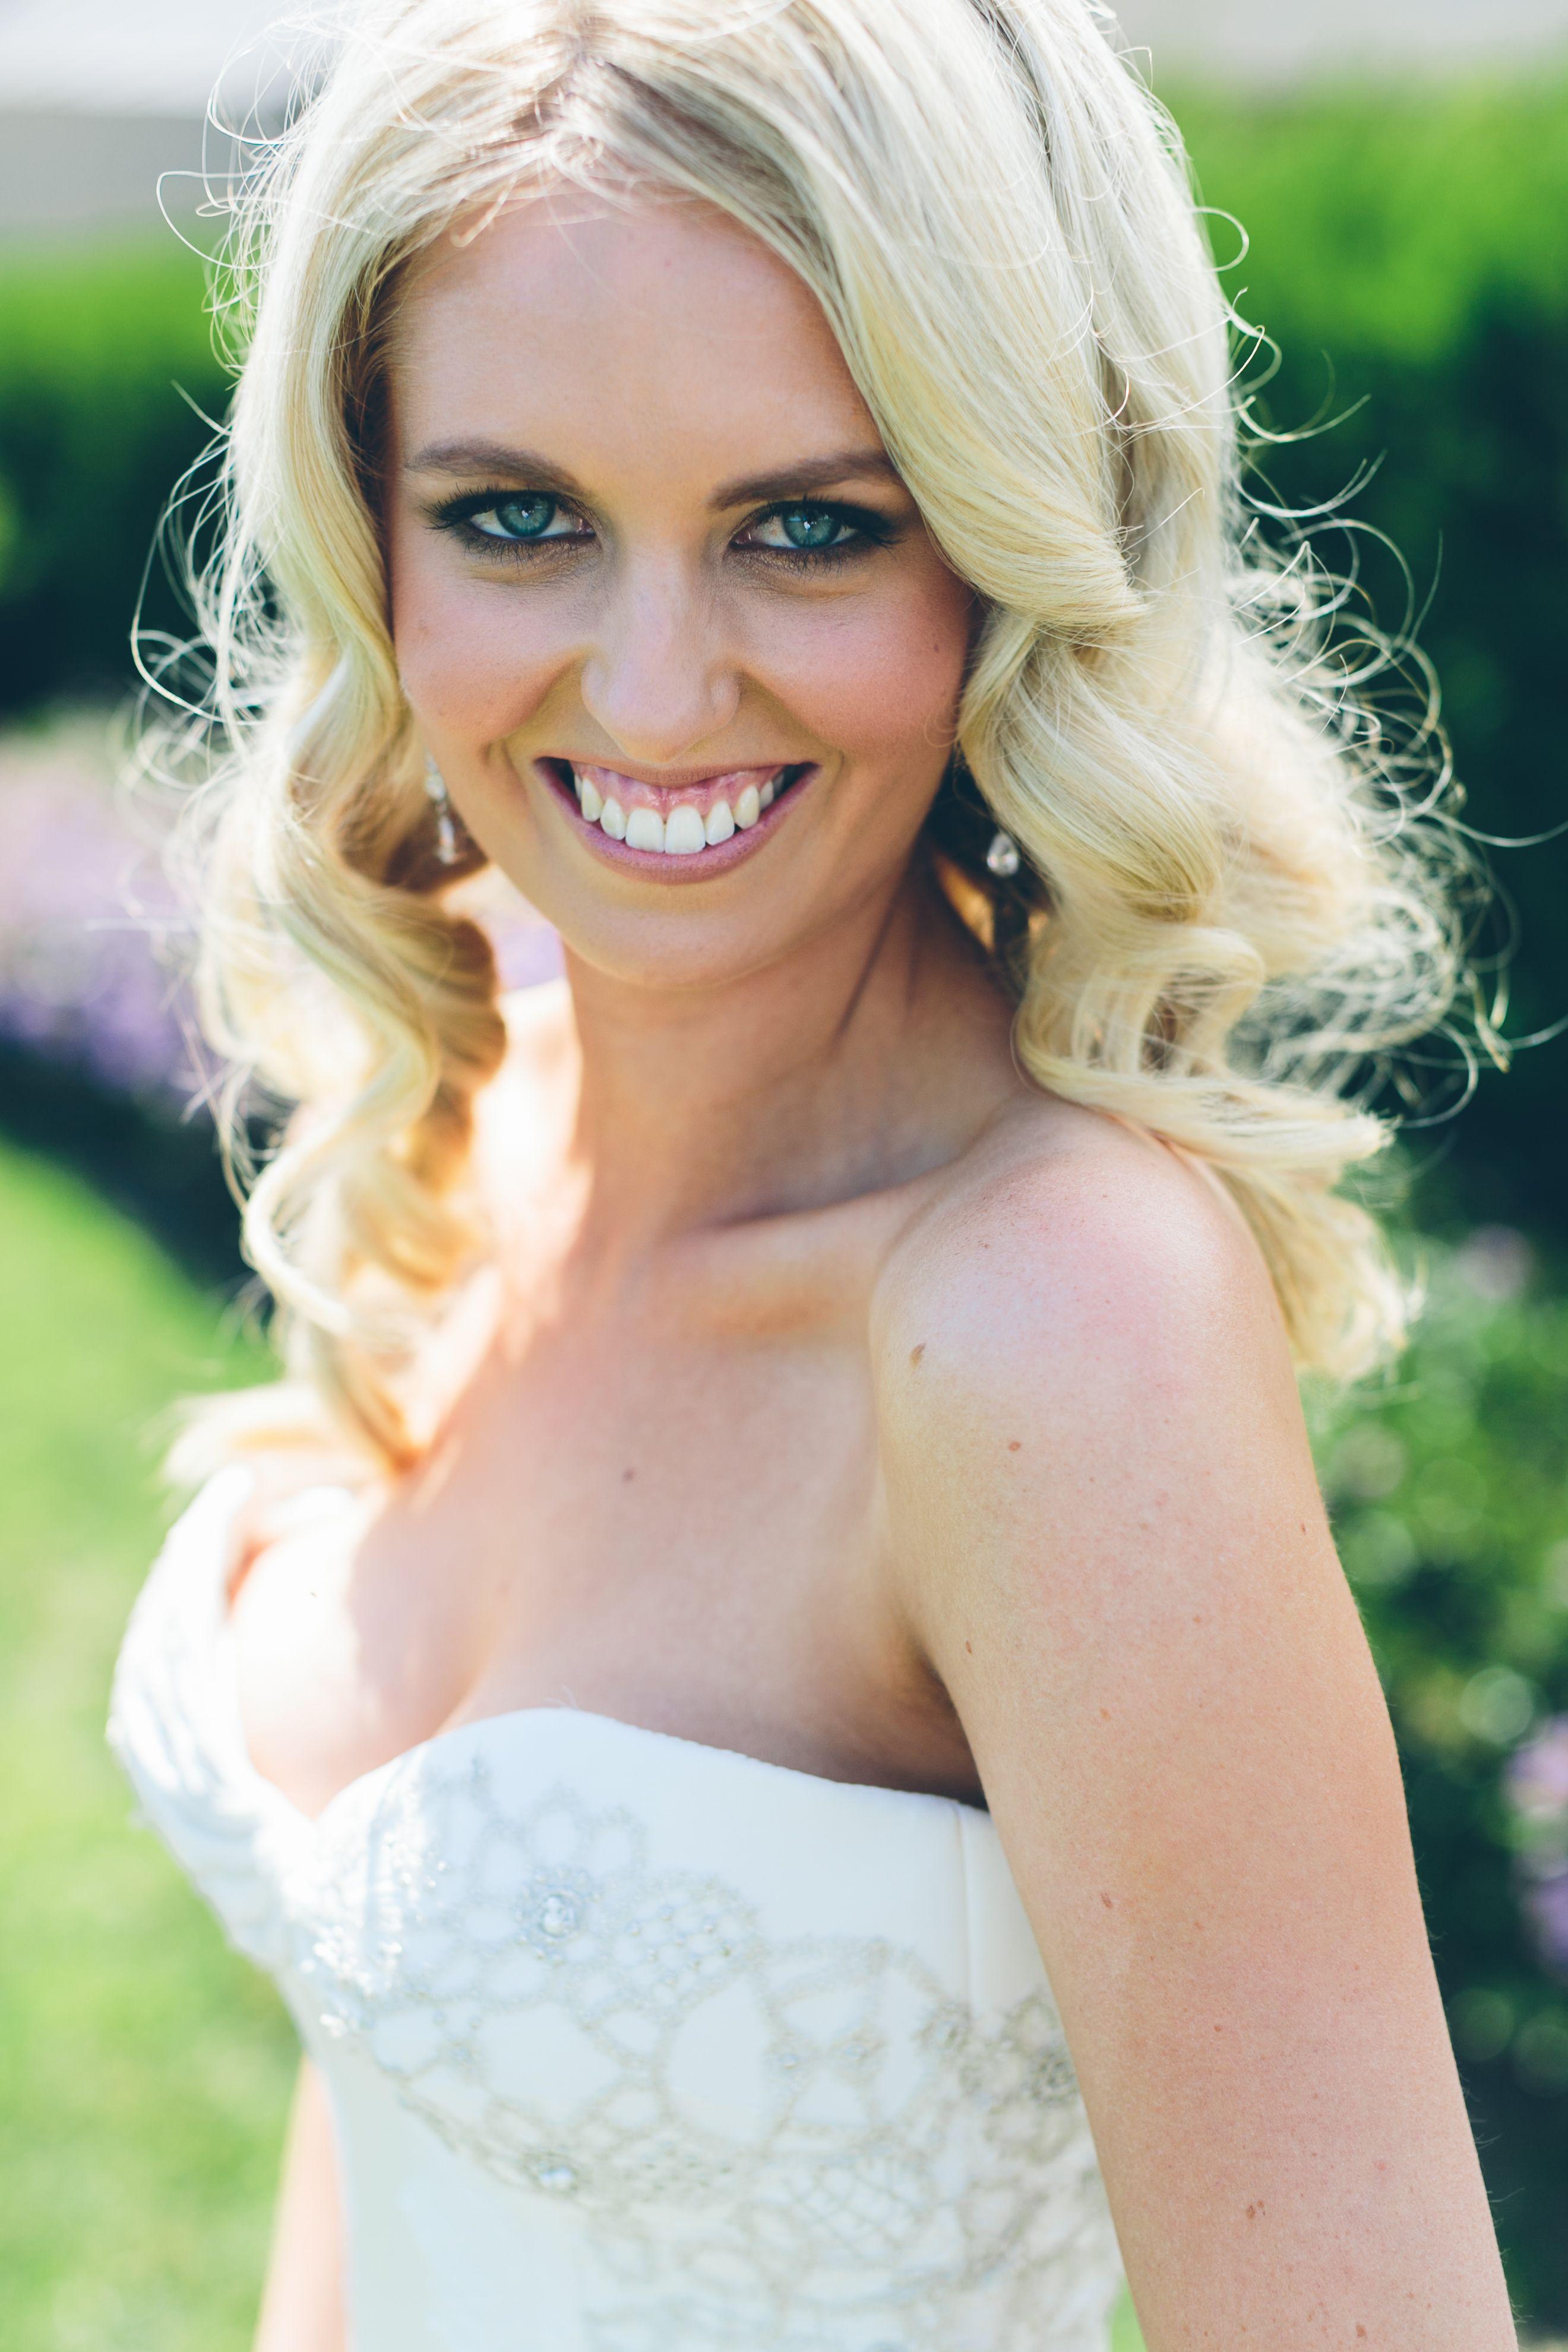 Wedding Makeup Sydney Makeup artist sydney, Artistry